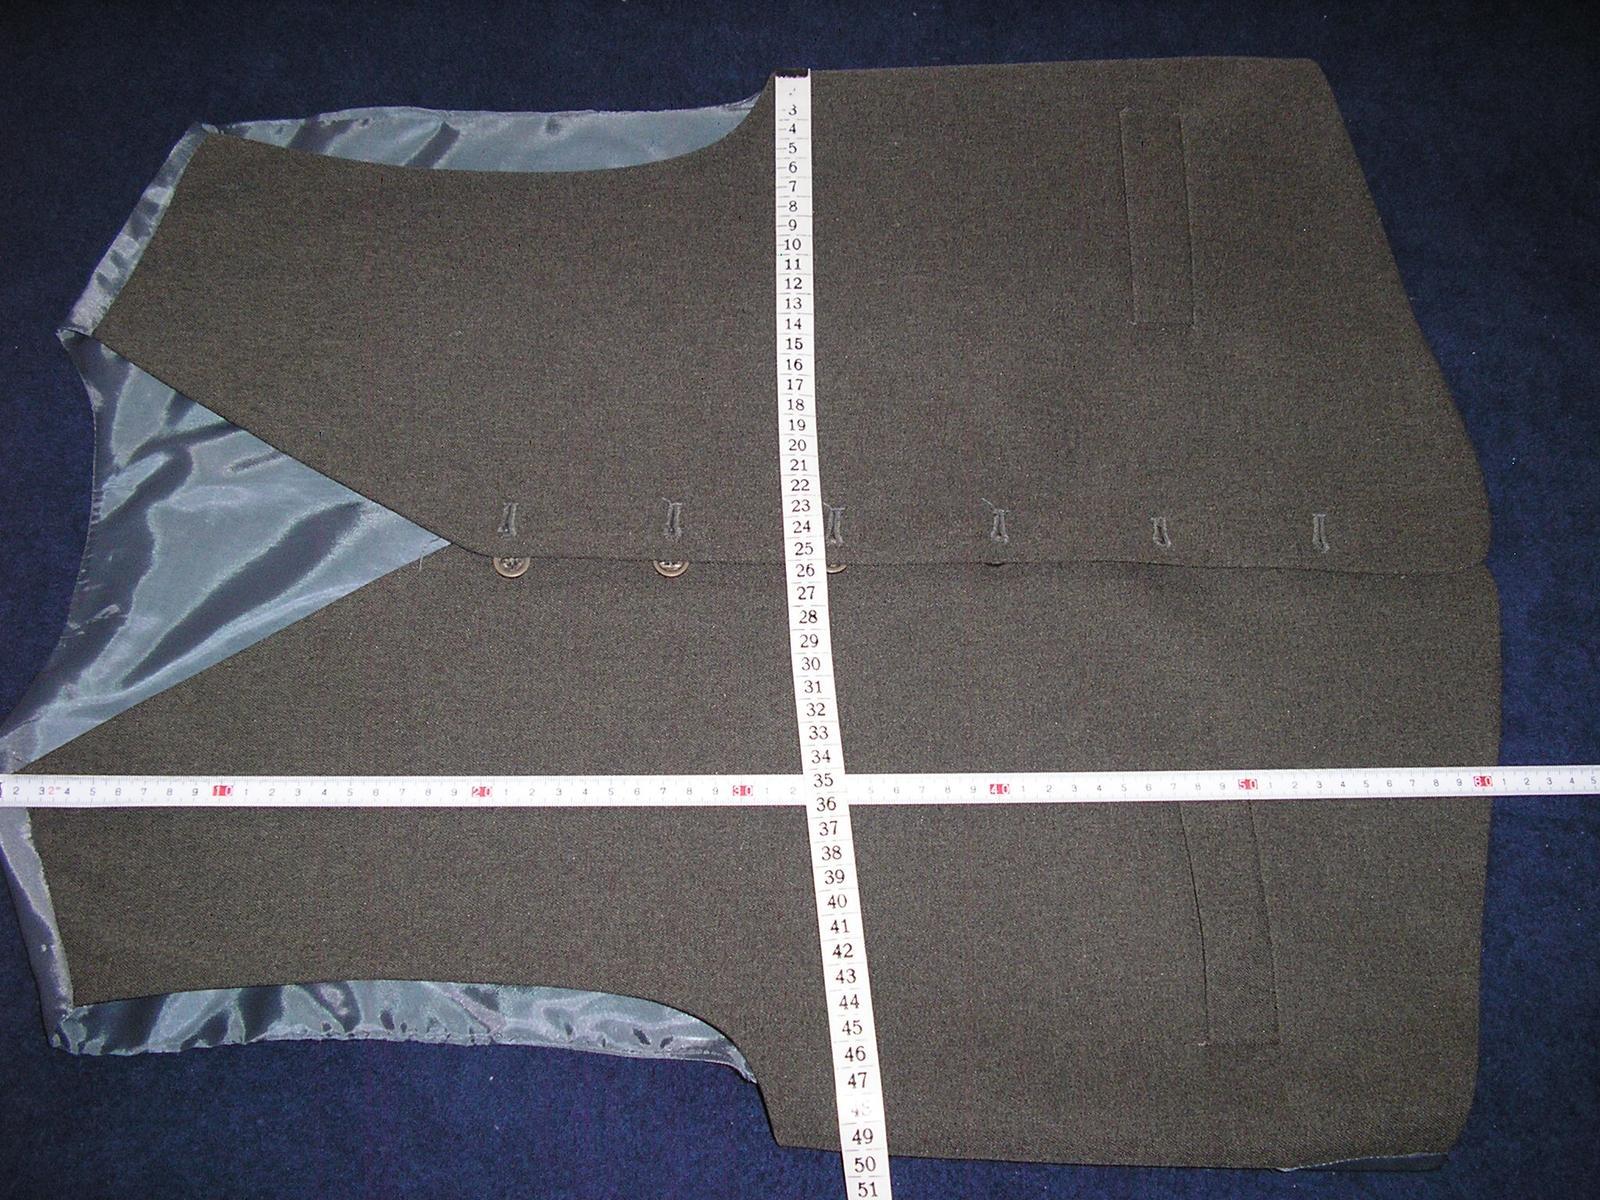 1291. Stadler Faschion sivý oblek - Obrázok č. 4